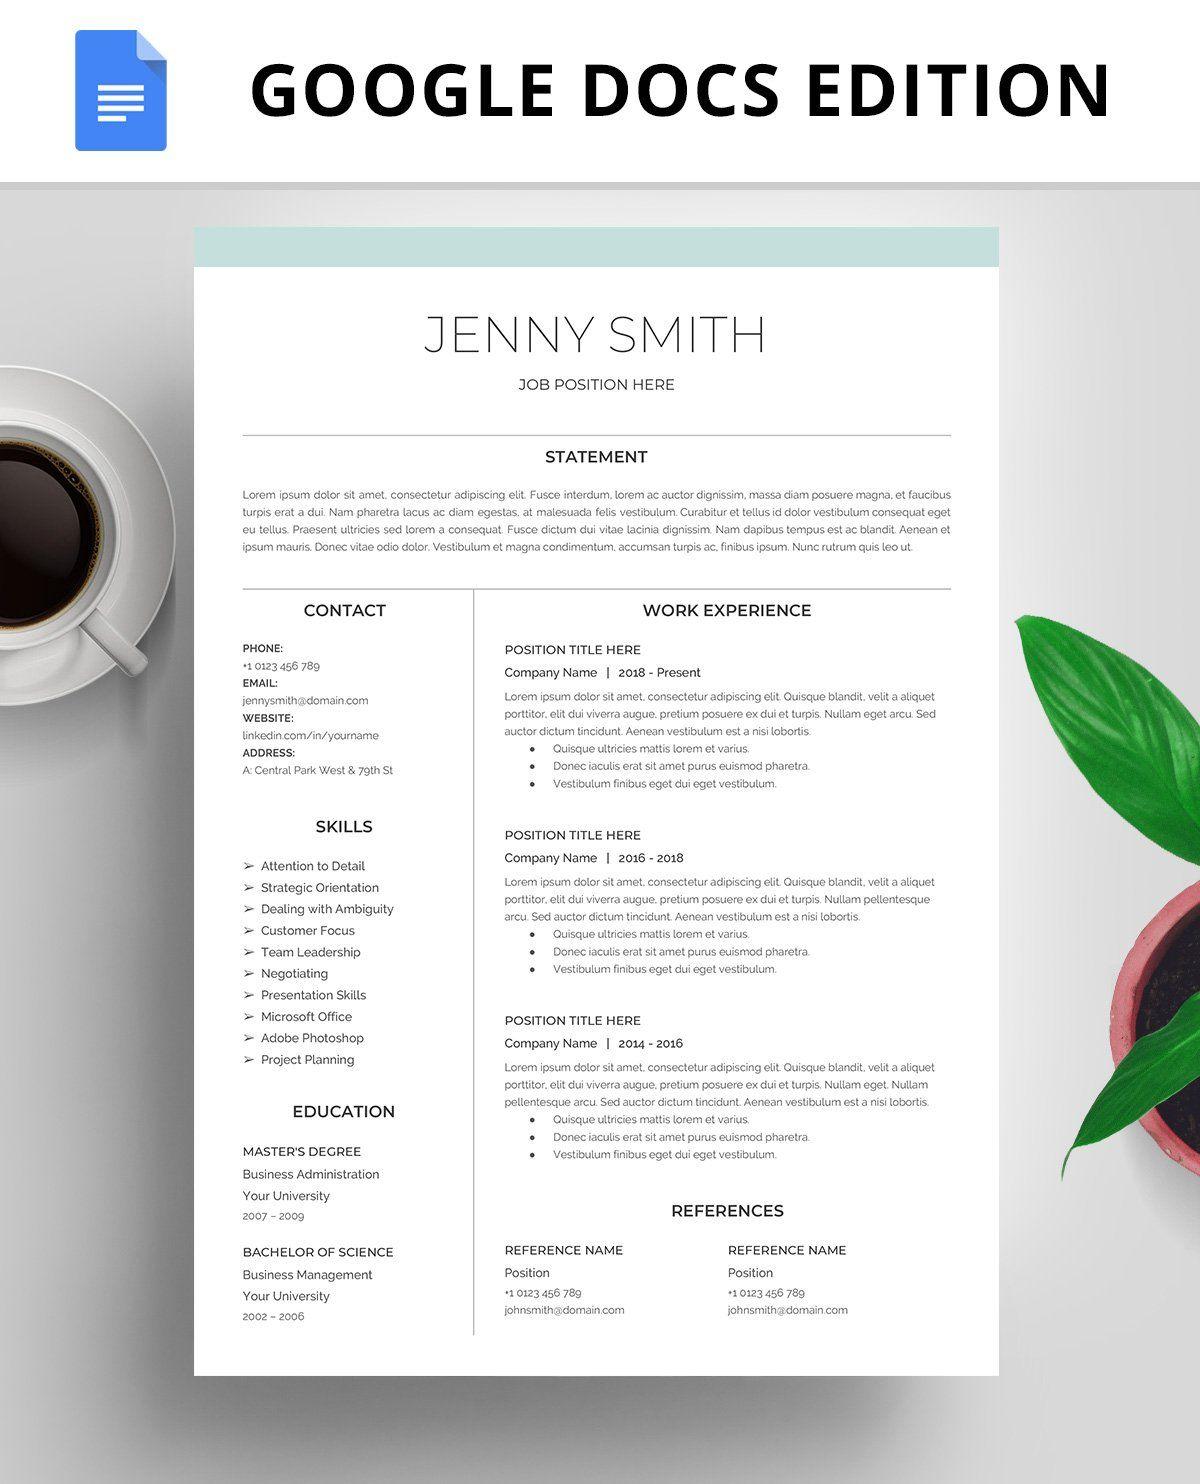 Resume Template Cv Google Docs Resume Template Resume Templates Resume Template Professional